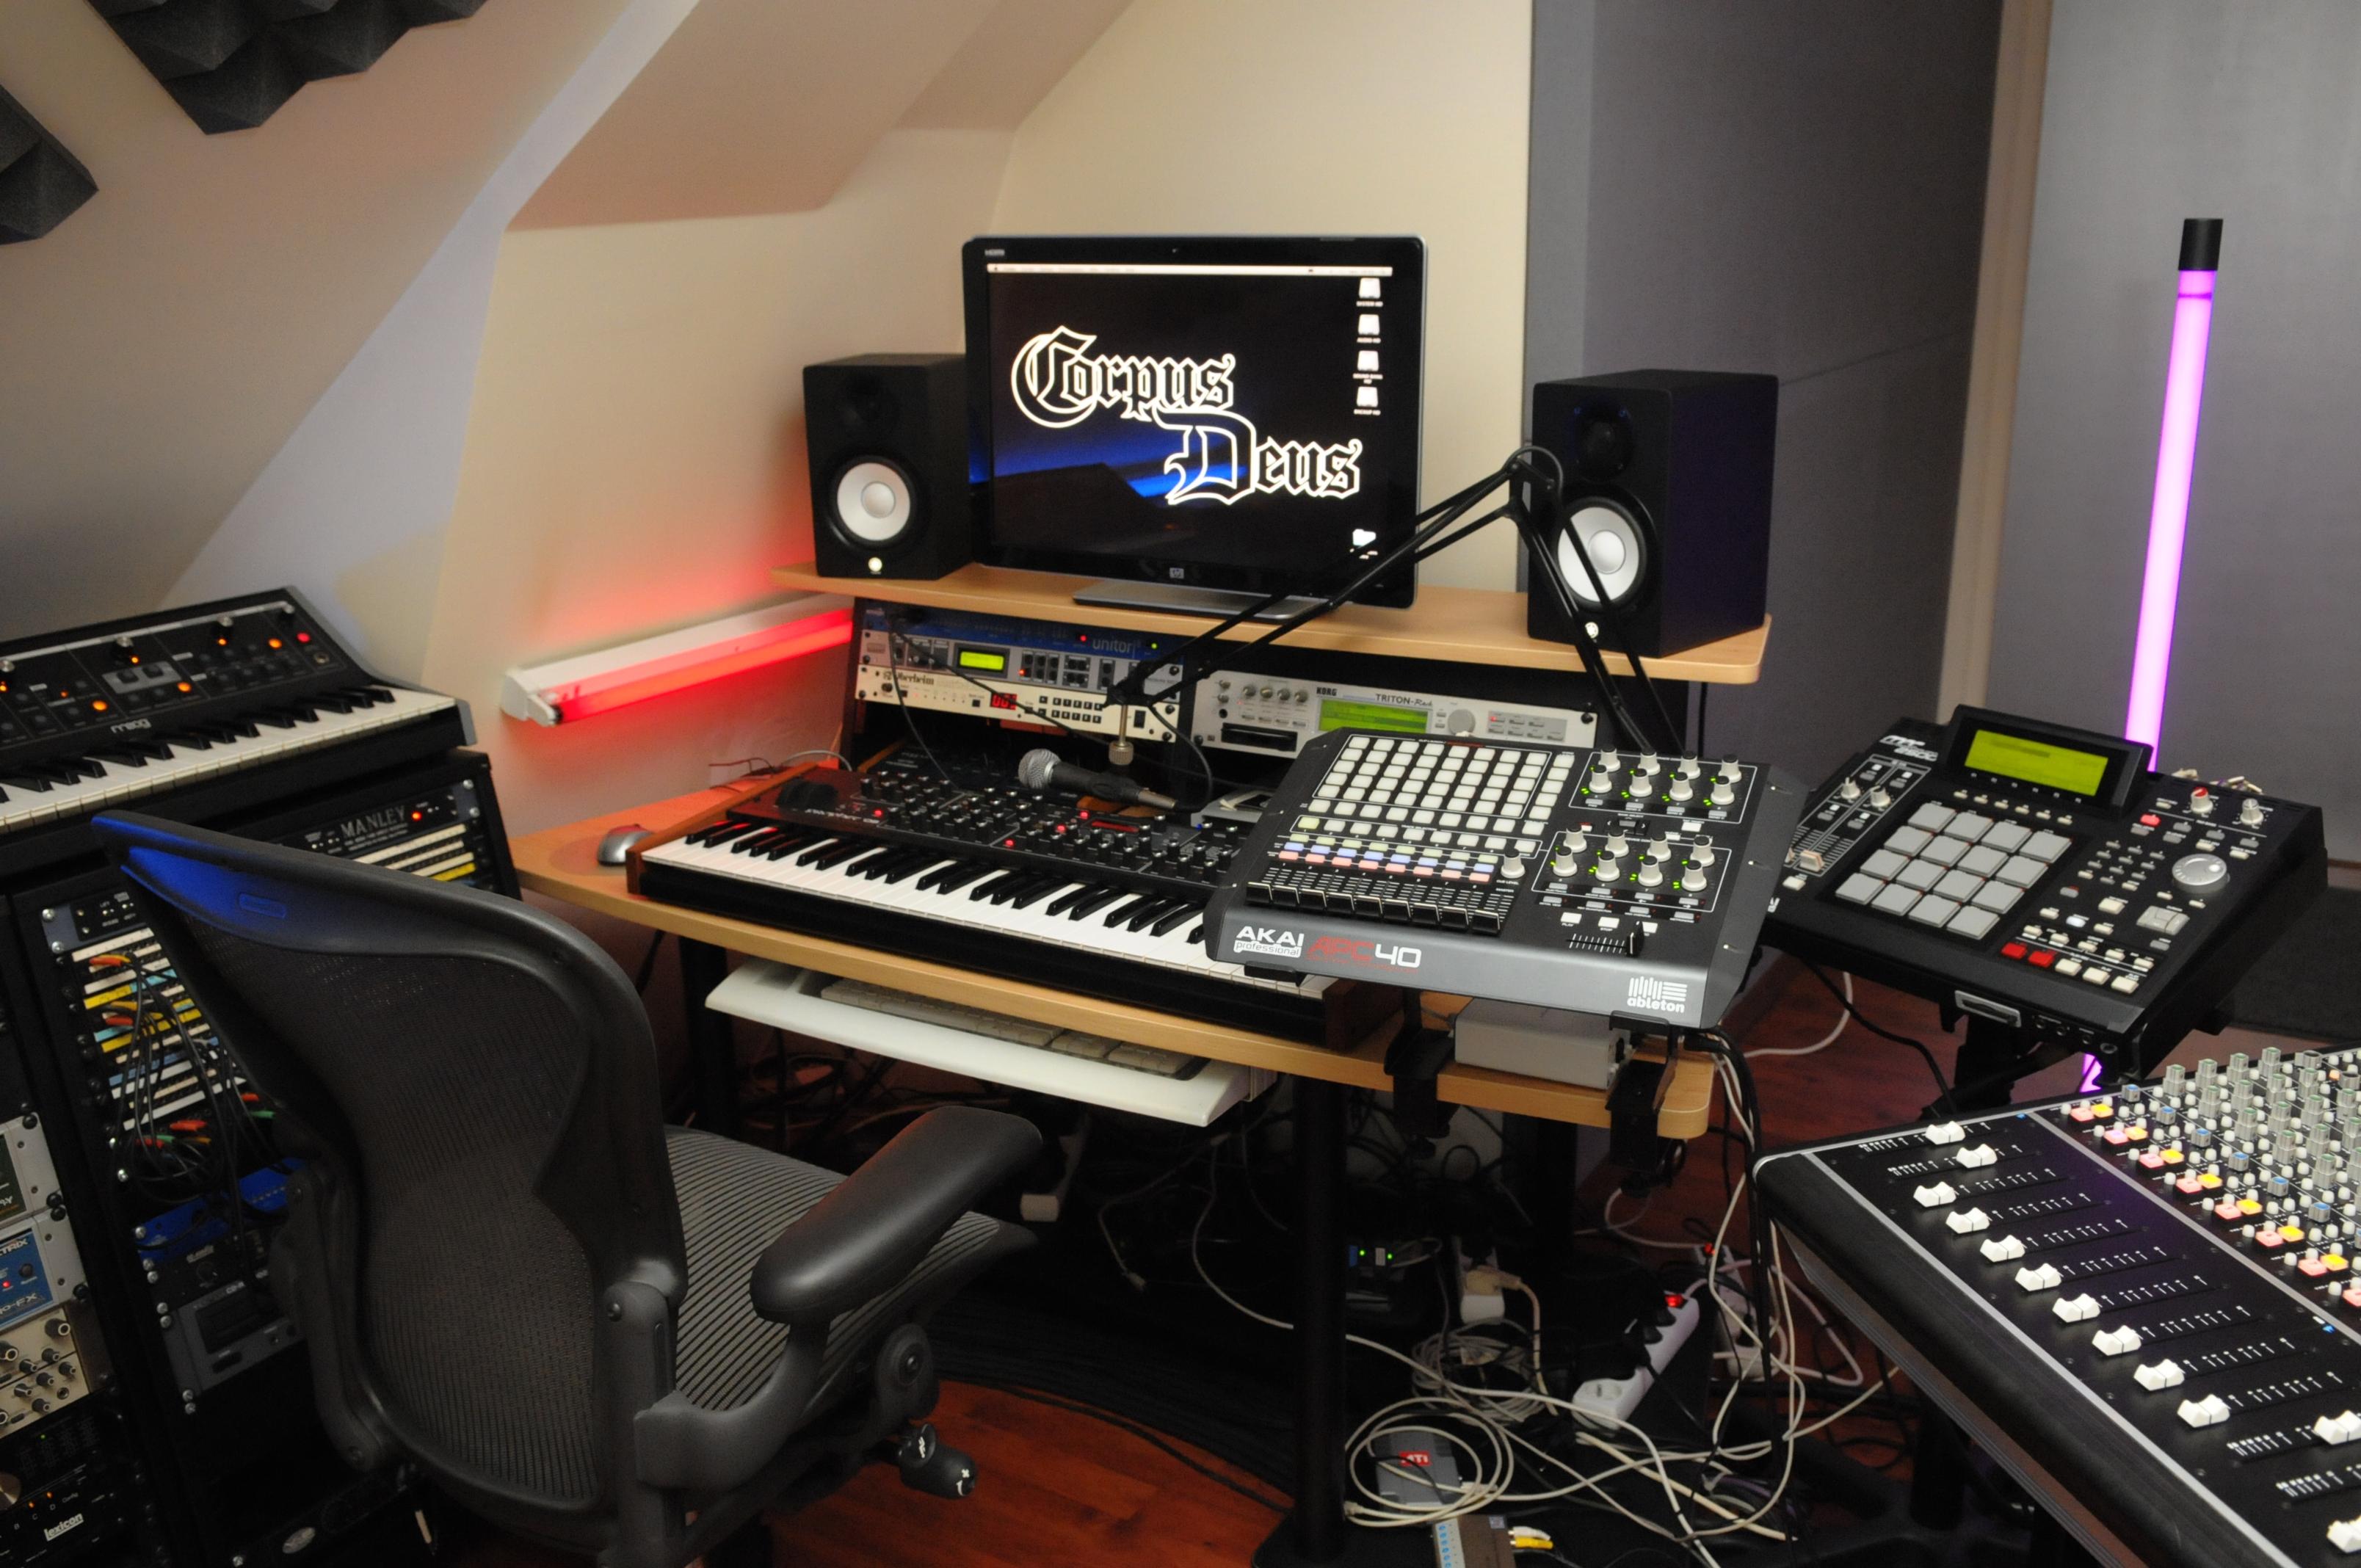 Studio Rta Creation Station Studio Desk Studio Rta Creation Station